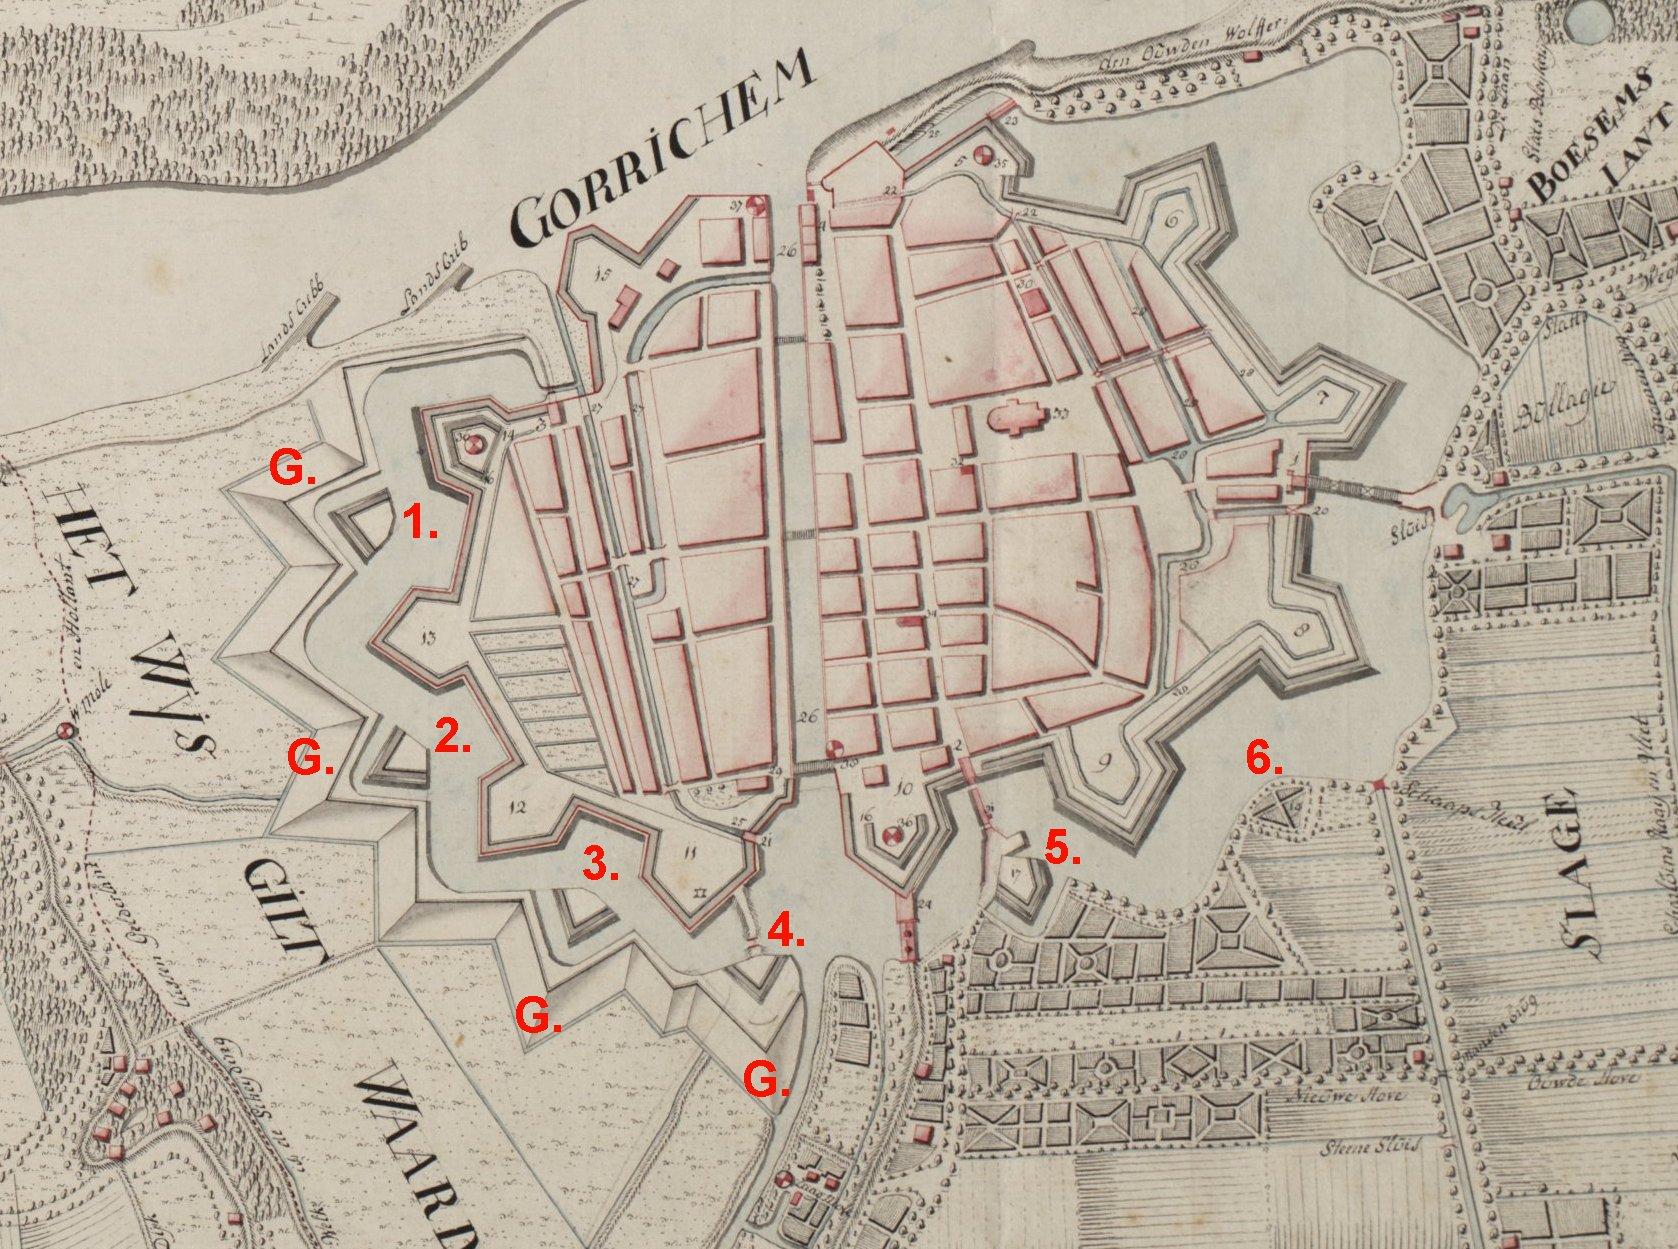 Gorinchem plattegrond 1776